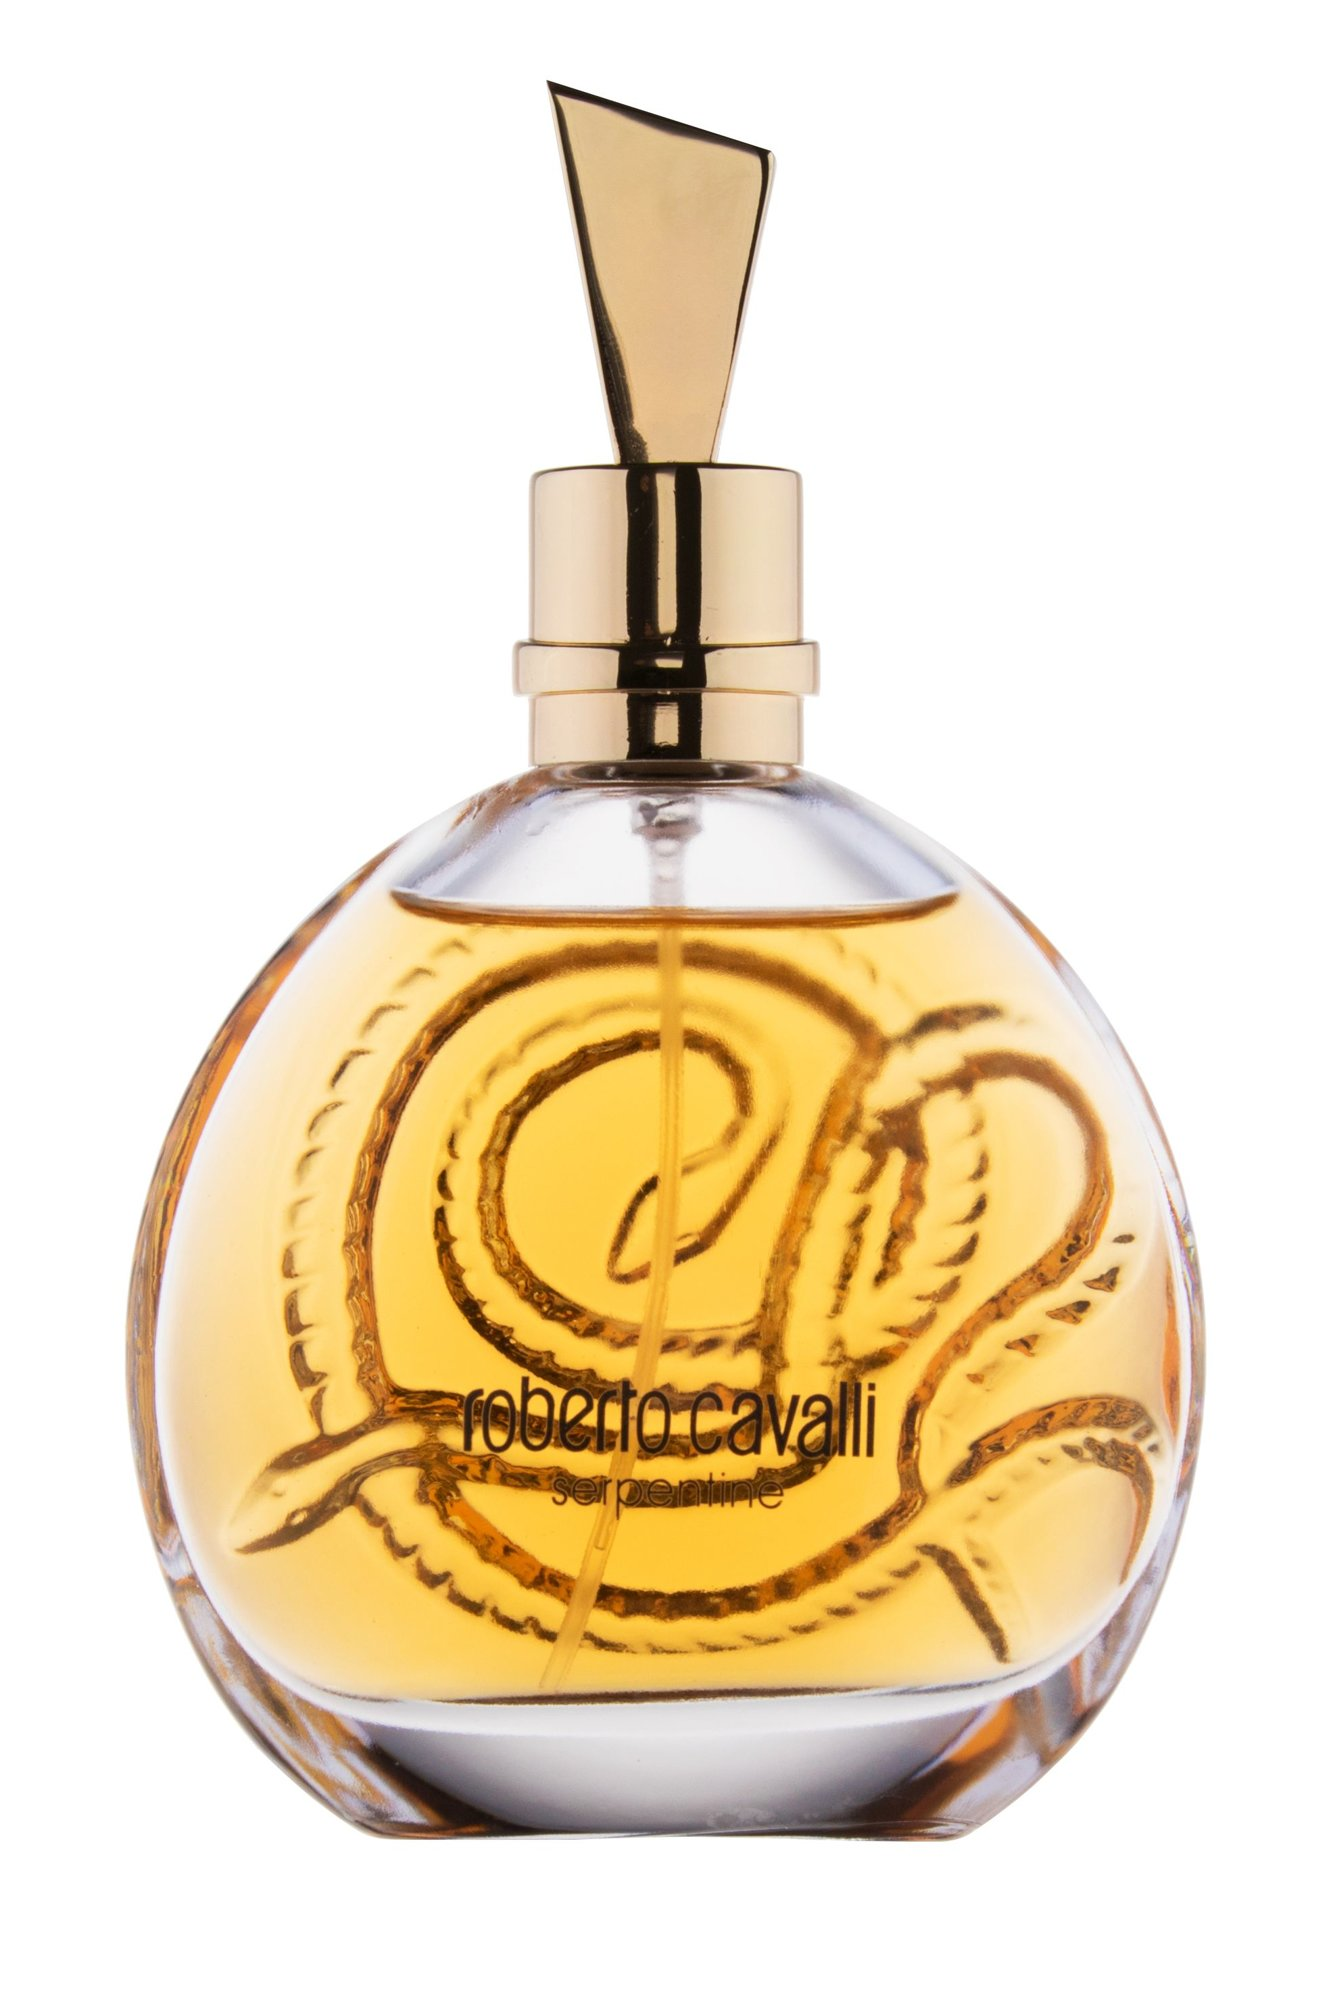 Roberto Cavalli Serpentine, Parfumovaná voda 90ml - Tester